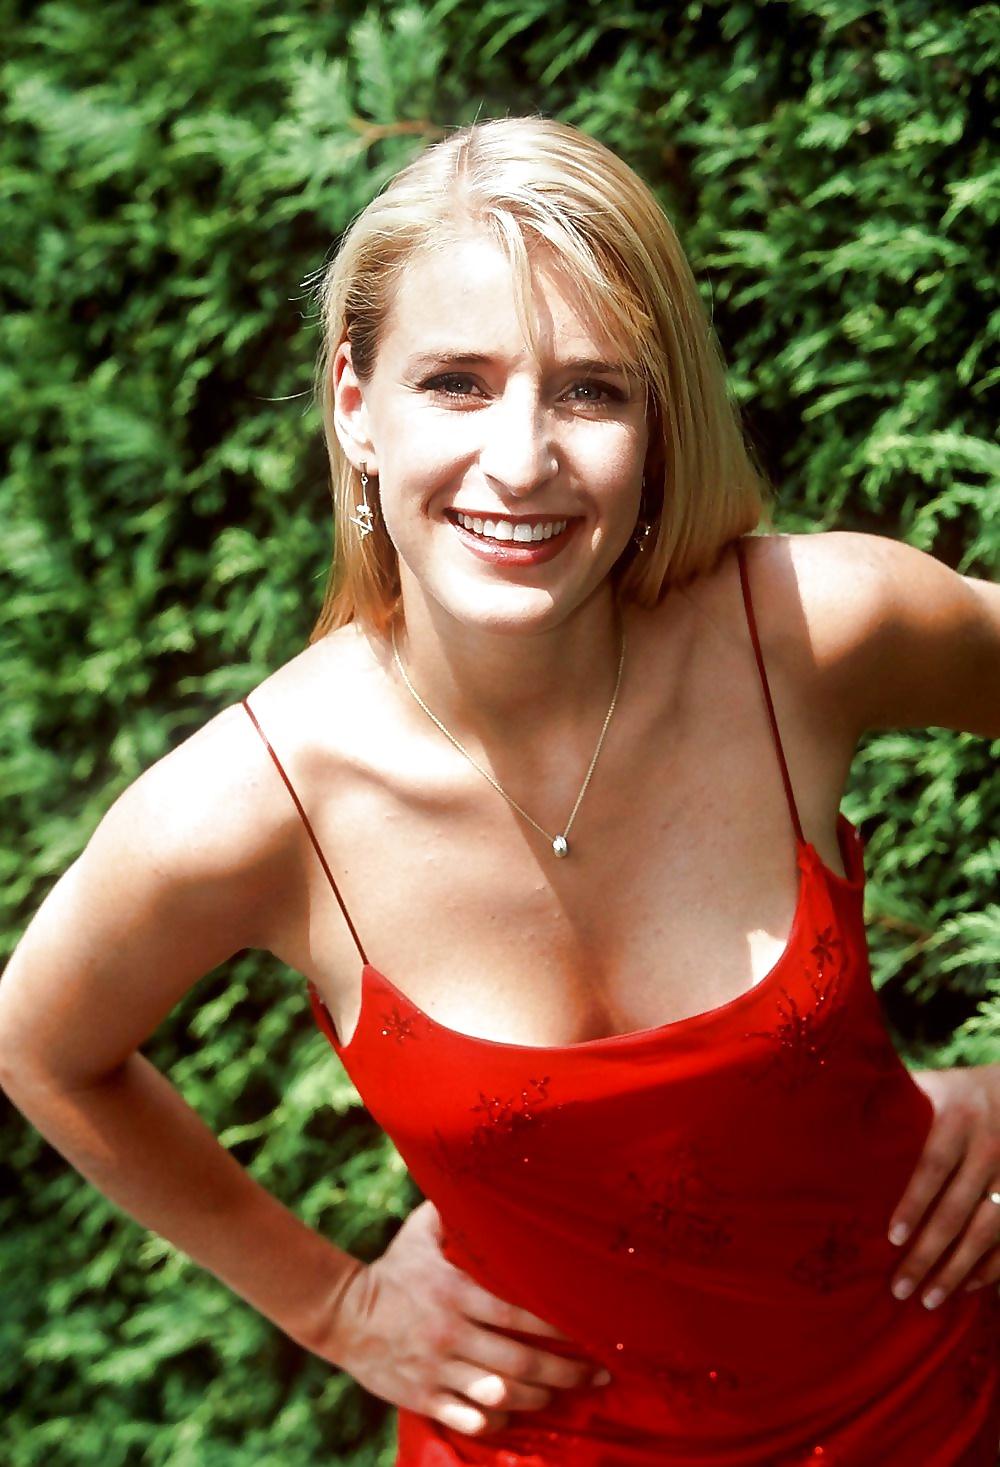 Porn hertel Stefanie Hertel